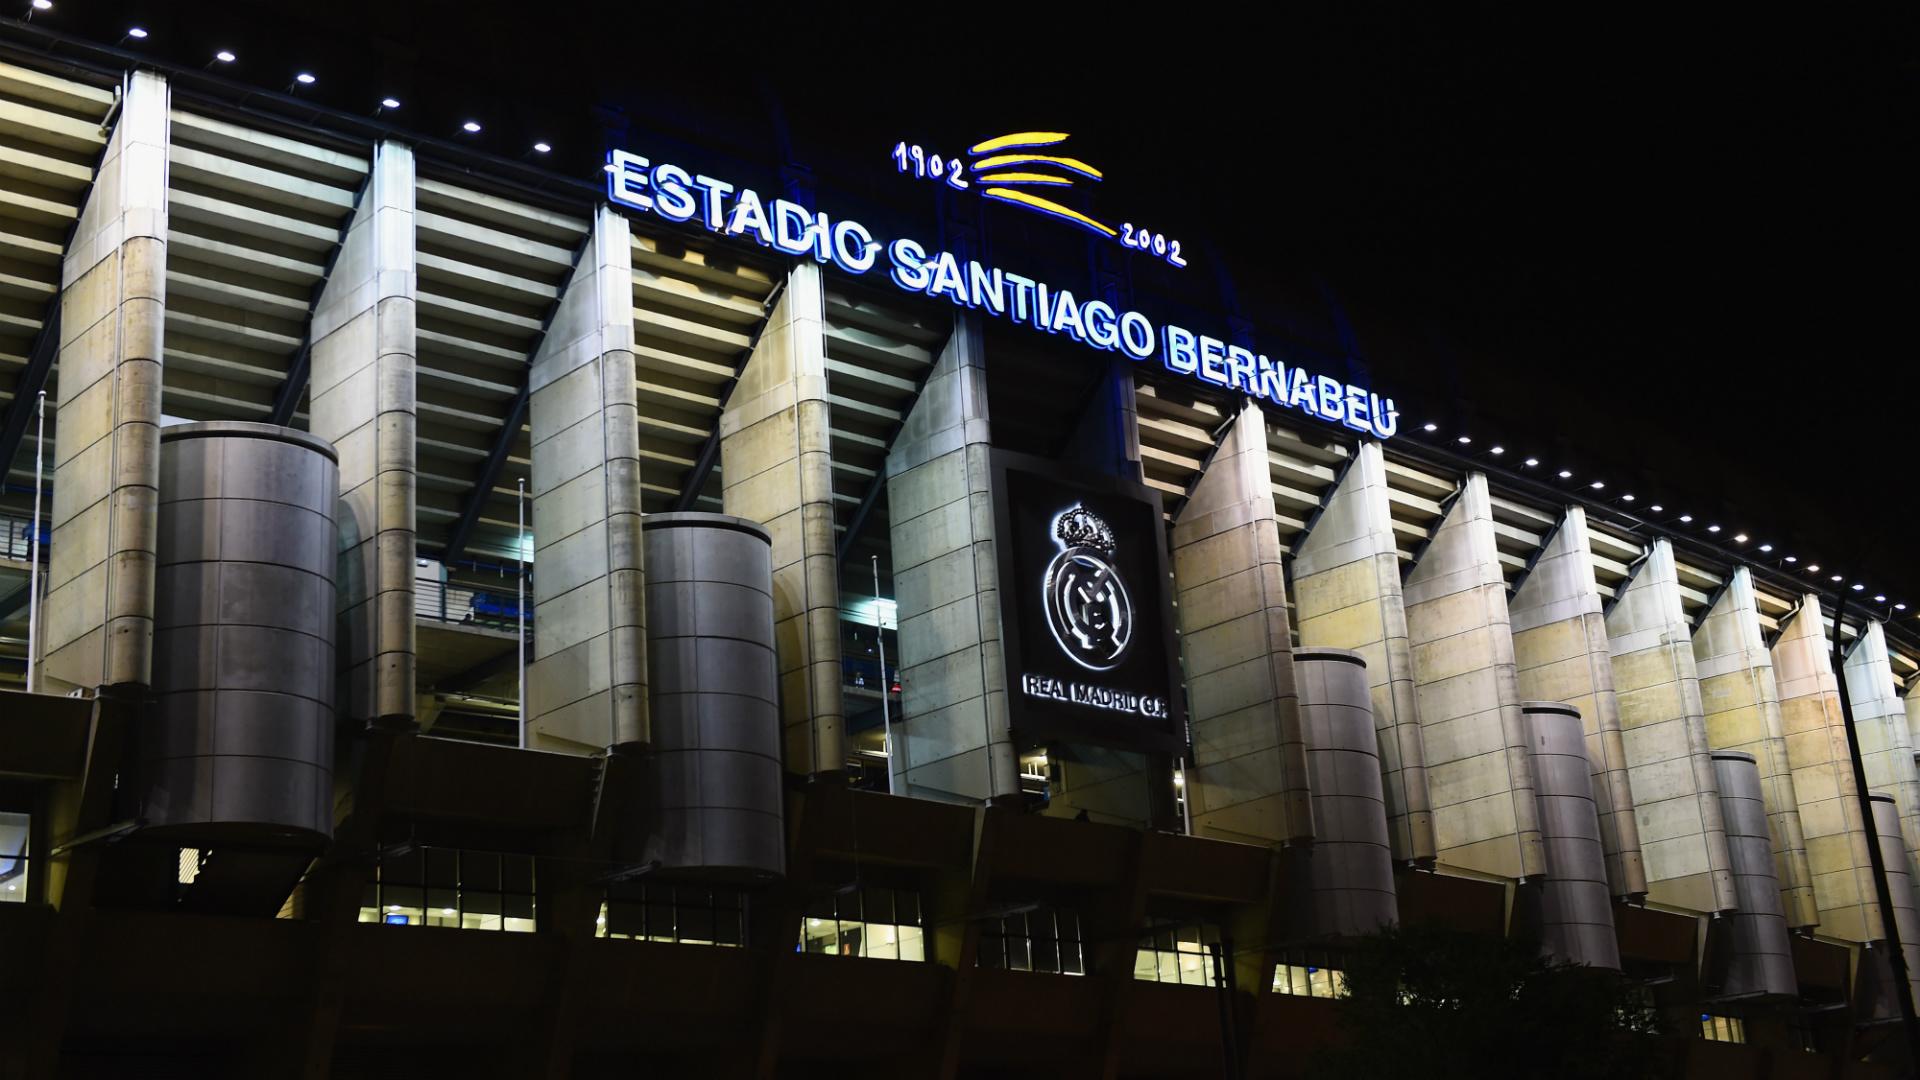 Santiago Bernabeu Stadium Real Madrid Liverpool UEFA Champions League 11042014 - Goal.com